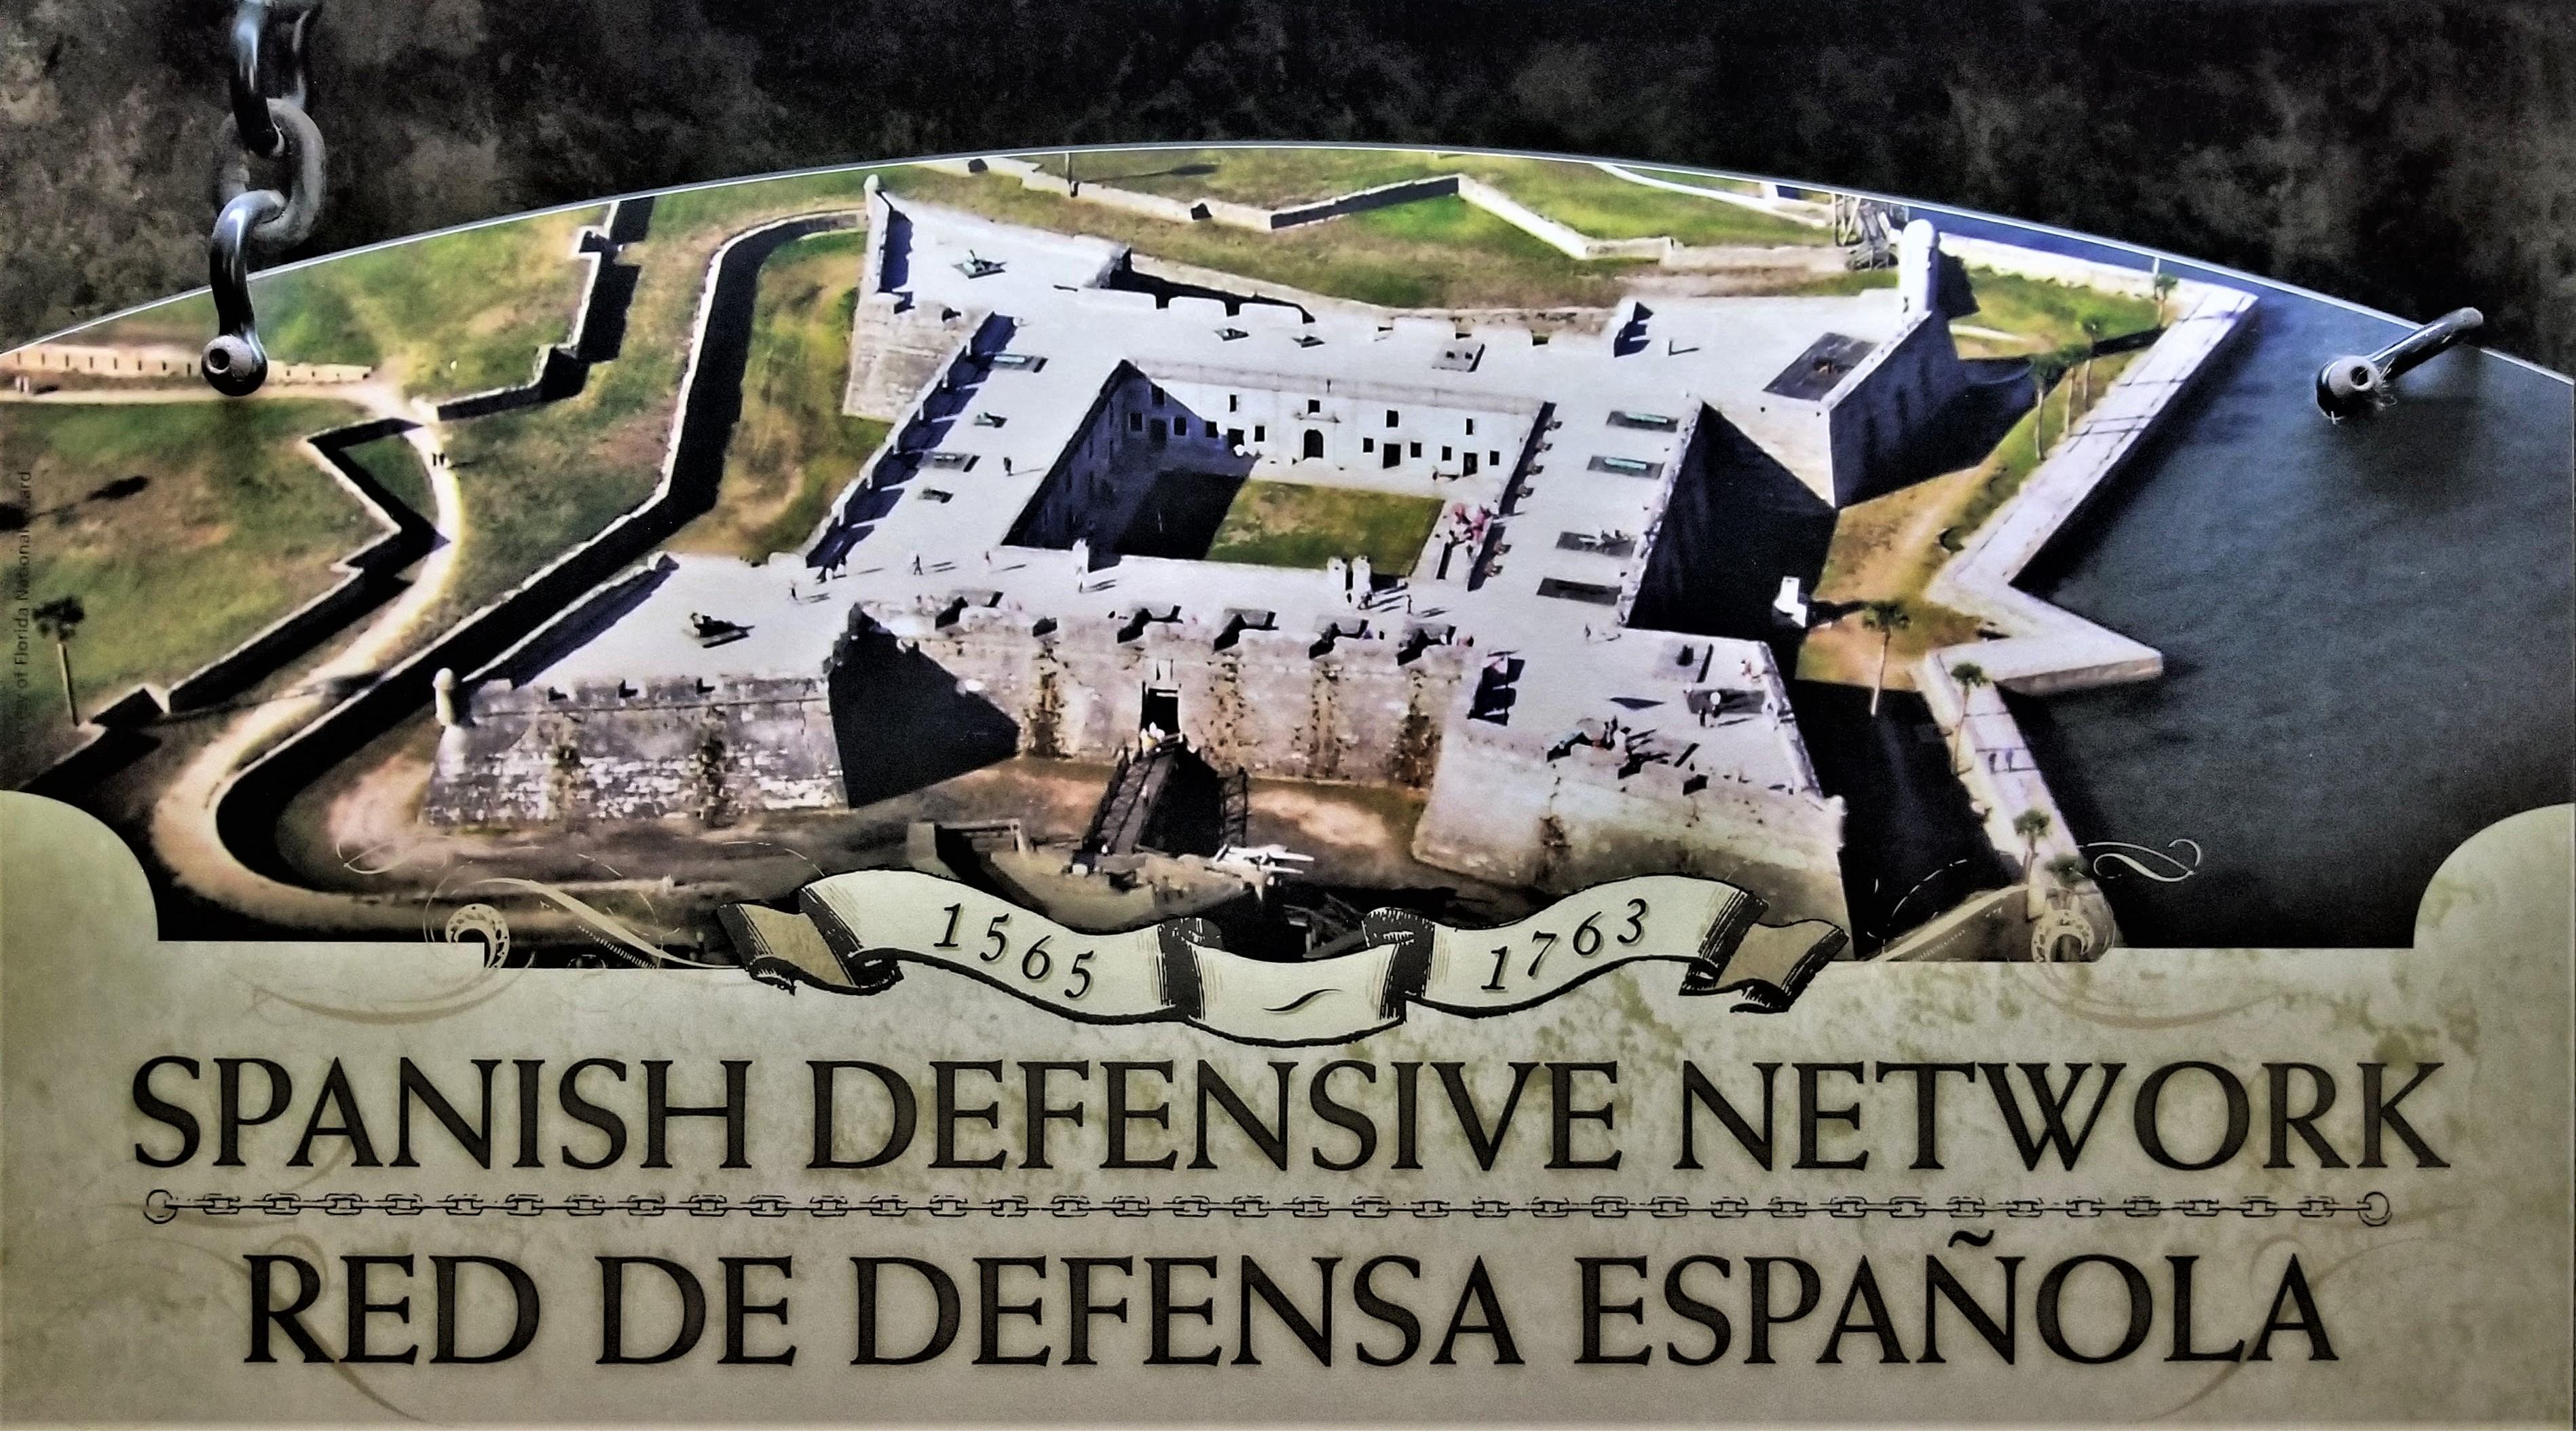 Spanish Defensive Network